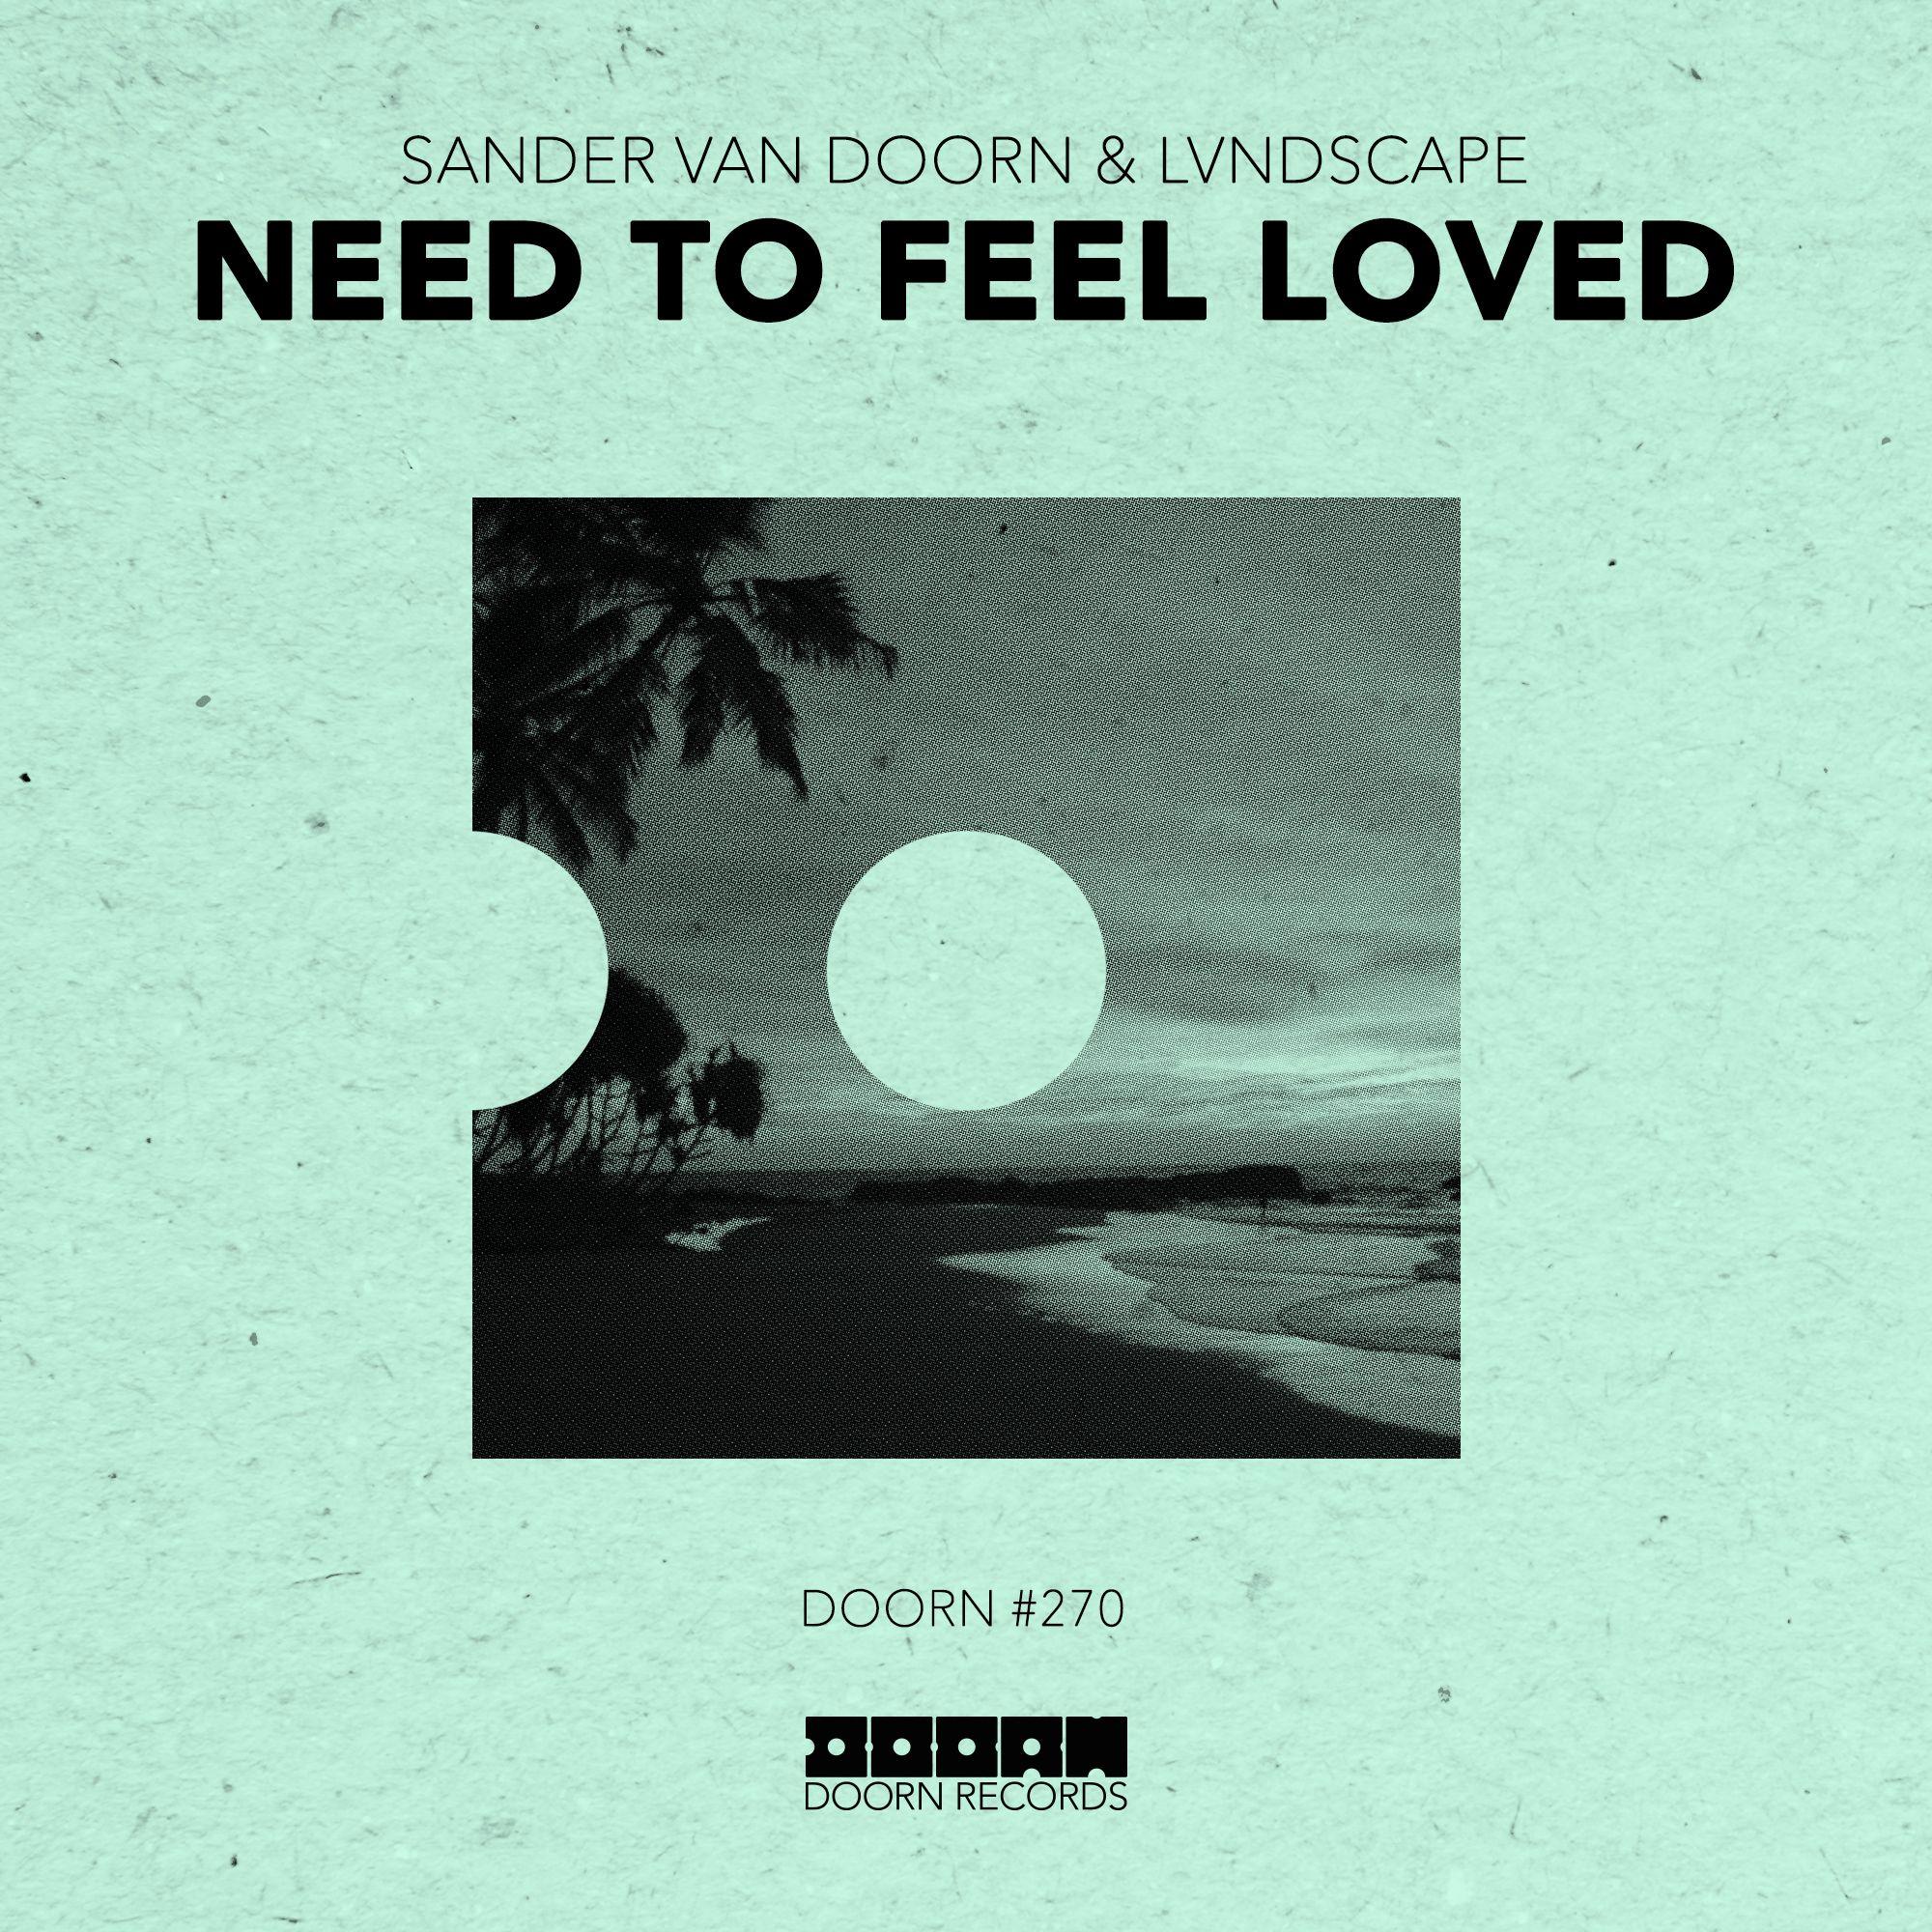 doorn_sander_van_doorn_lvndscape_-_need_to_feel_loved.jpg